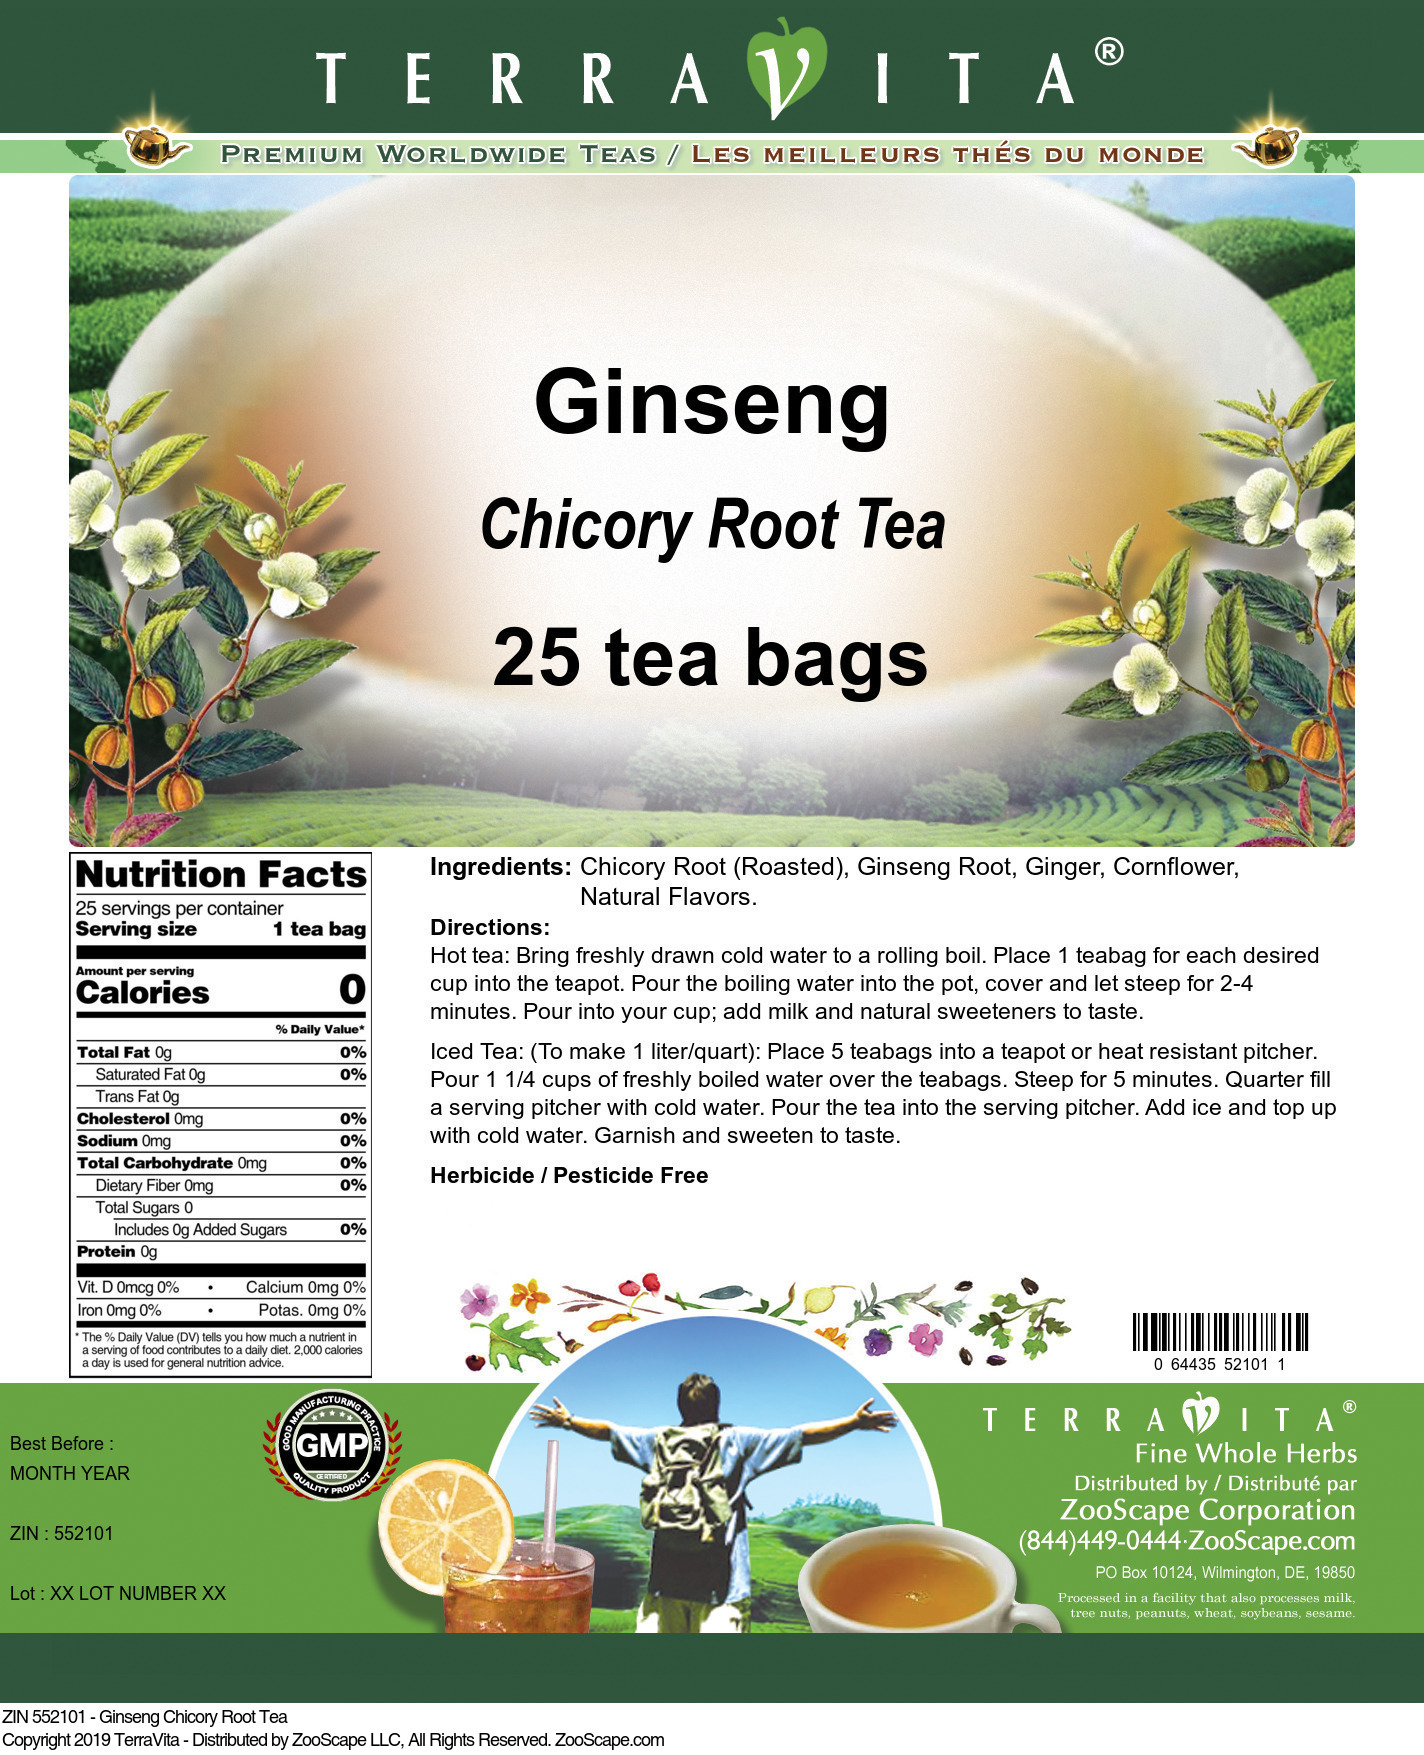 Ginseng Chicory Root Tea